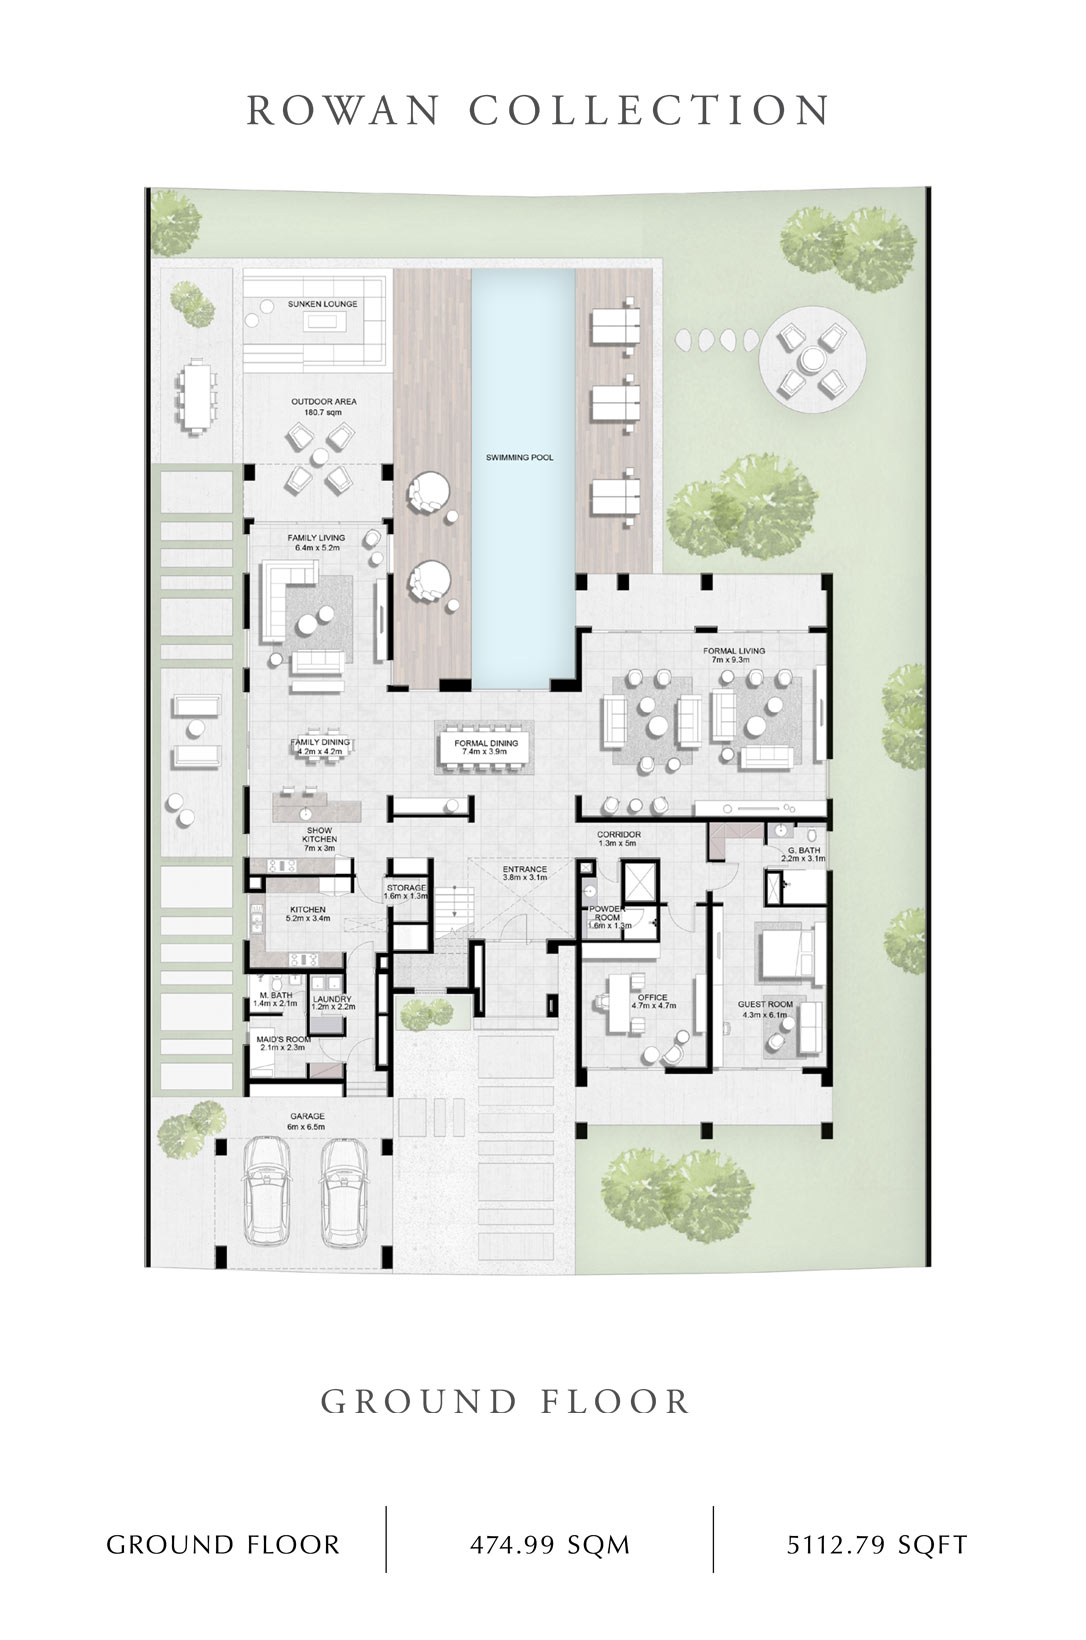 Rowan-Collection-Ground Floor, Size 5112 Sq Ft